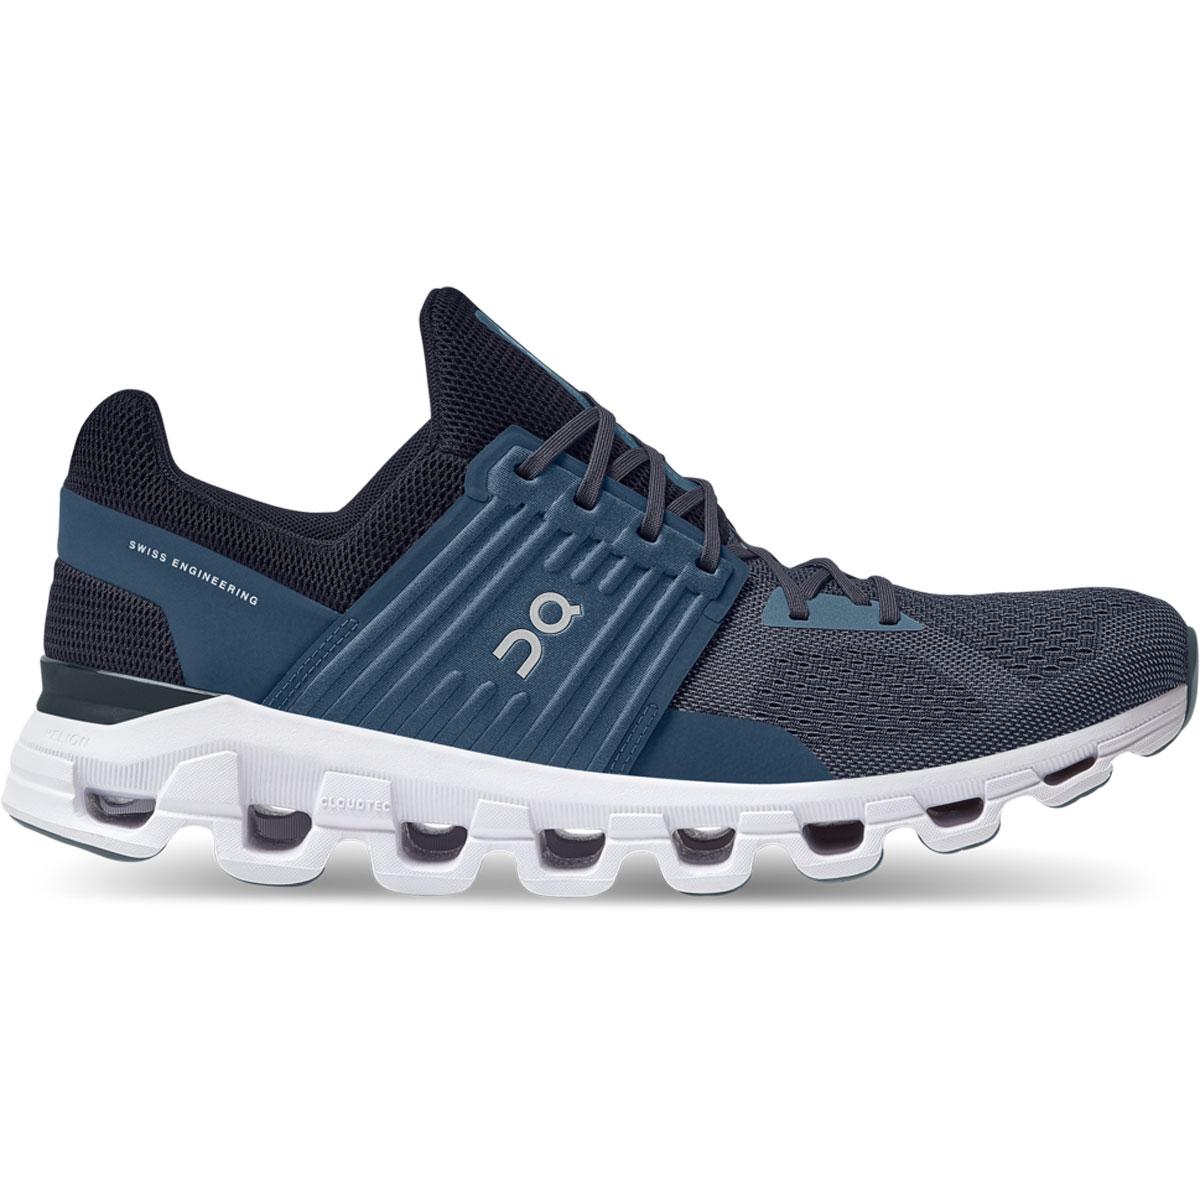 Men's On Cloudswift 2.0 Running Shoe - Color: Denim/Midnight - Size: 7 - Width: Regular, Denim/Midnight, large, image 1